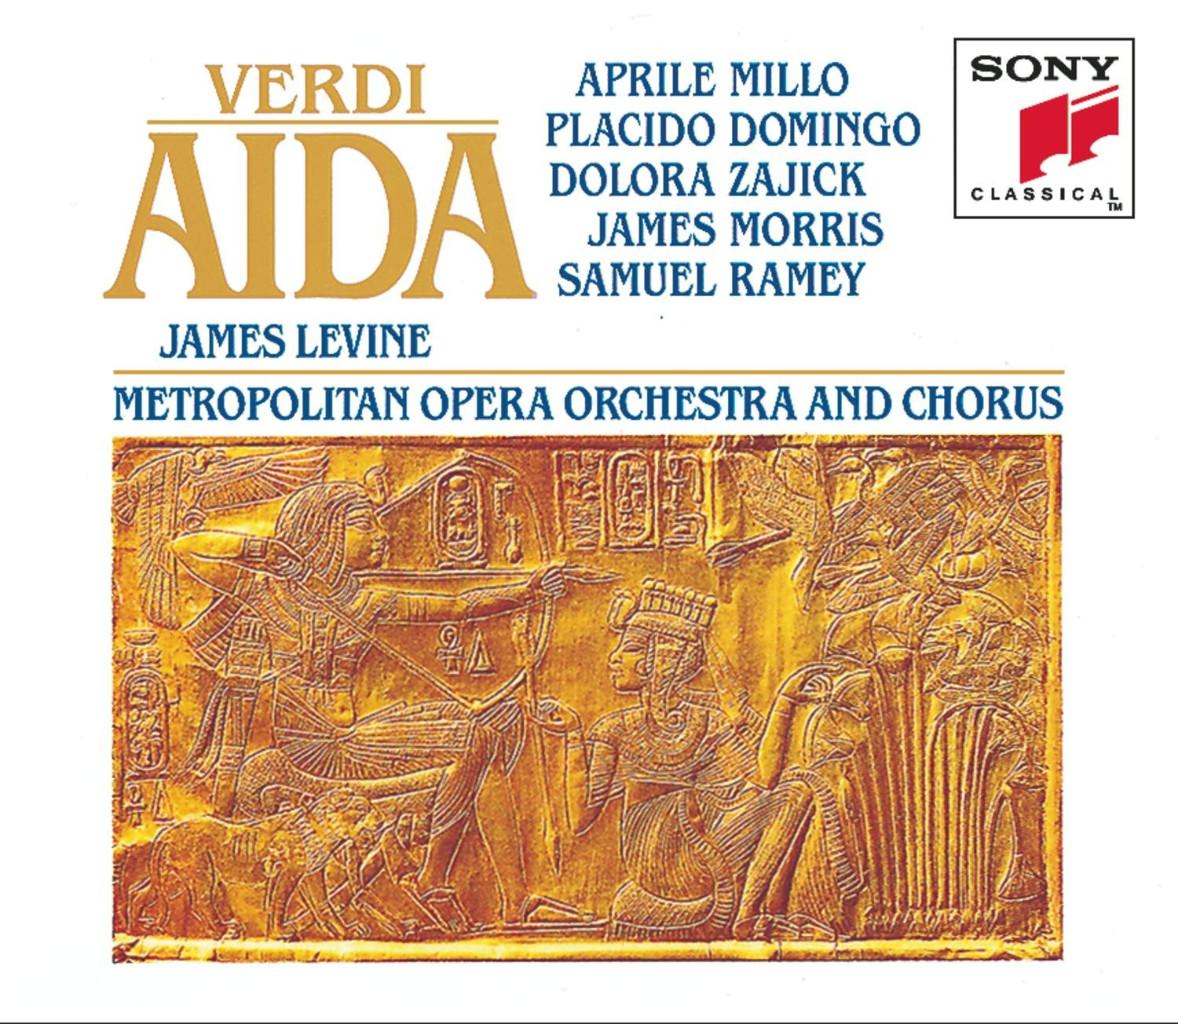 Image 0 of Verdi: Aida / Millo, Domingo, Zajick, Morris, Ramey; Levine